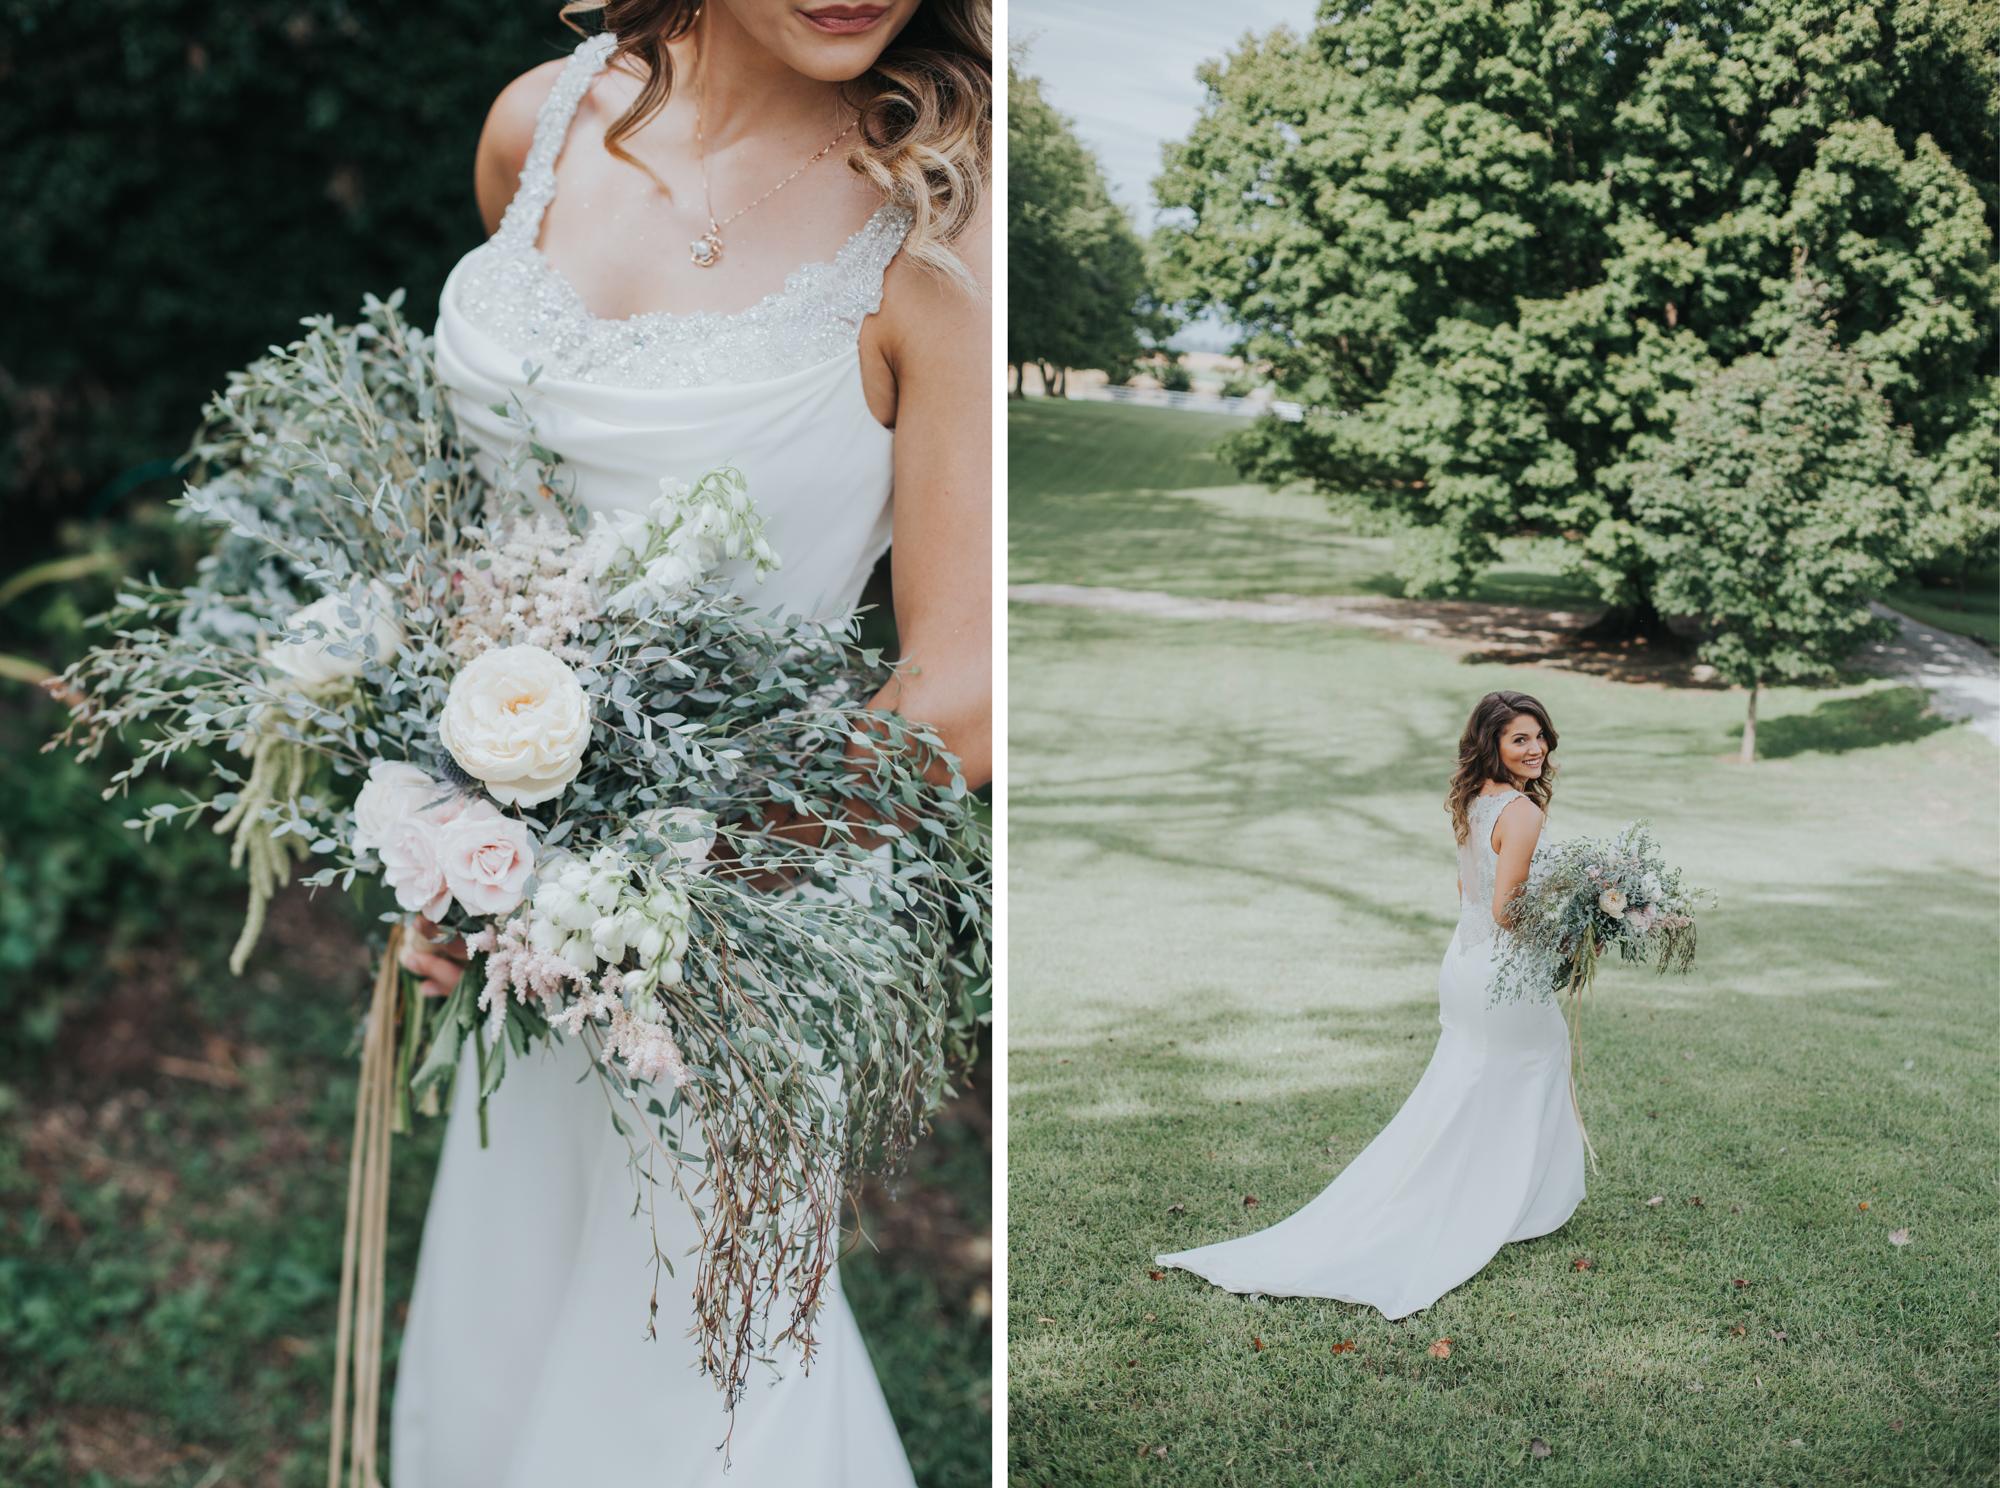 bridal-0013.jpg